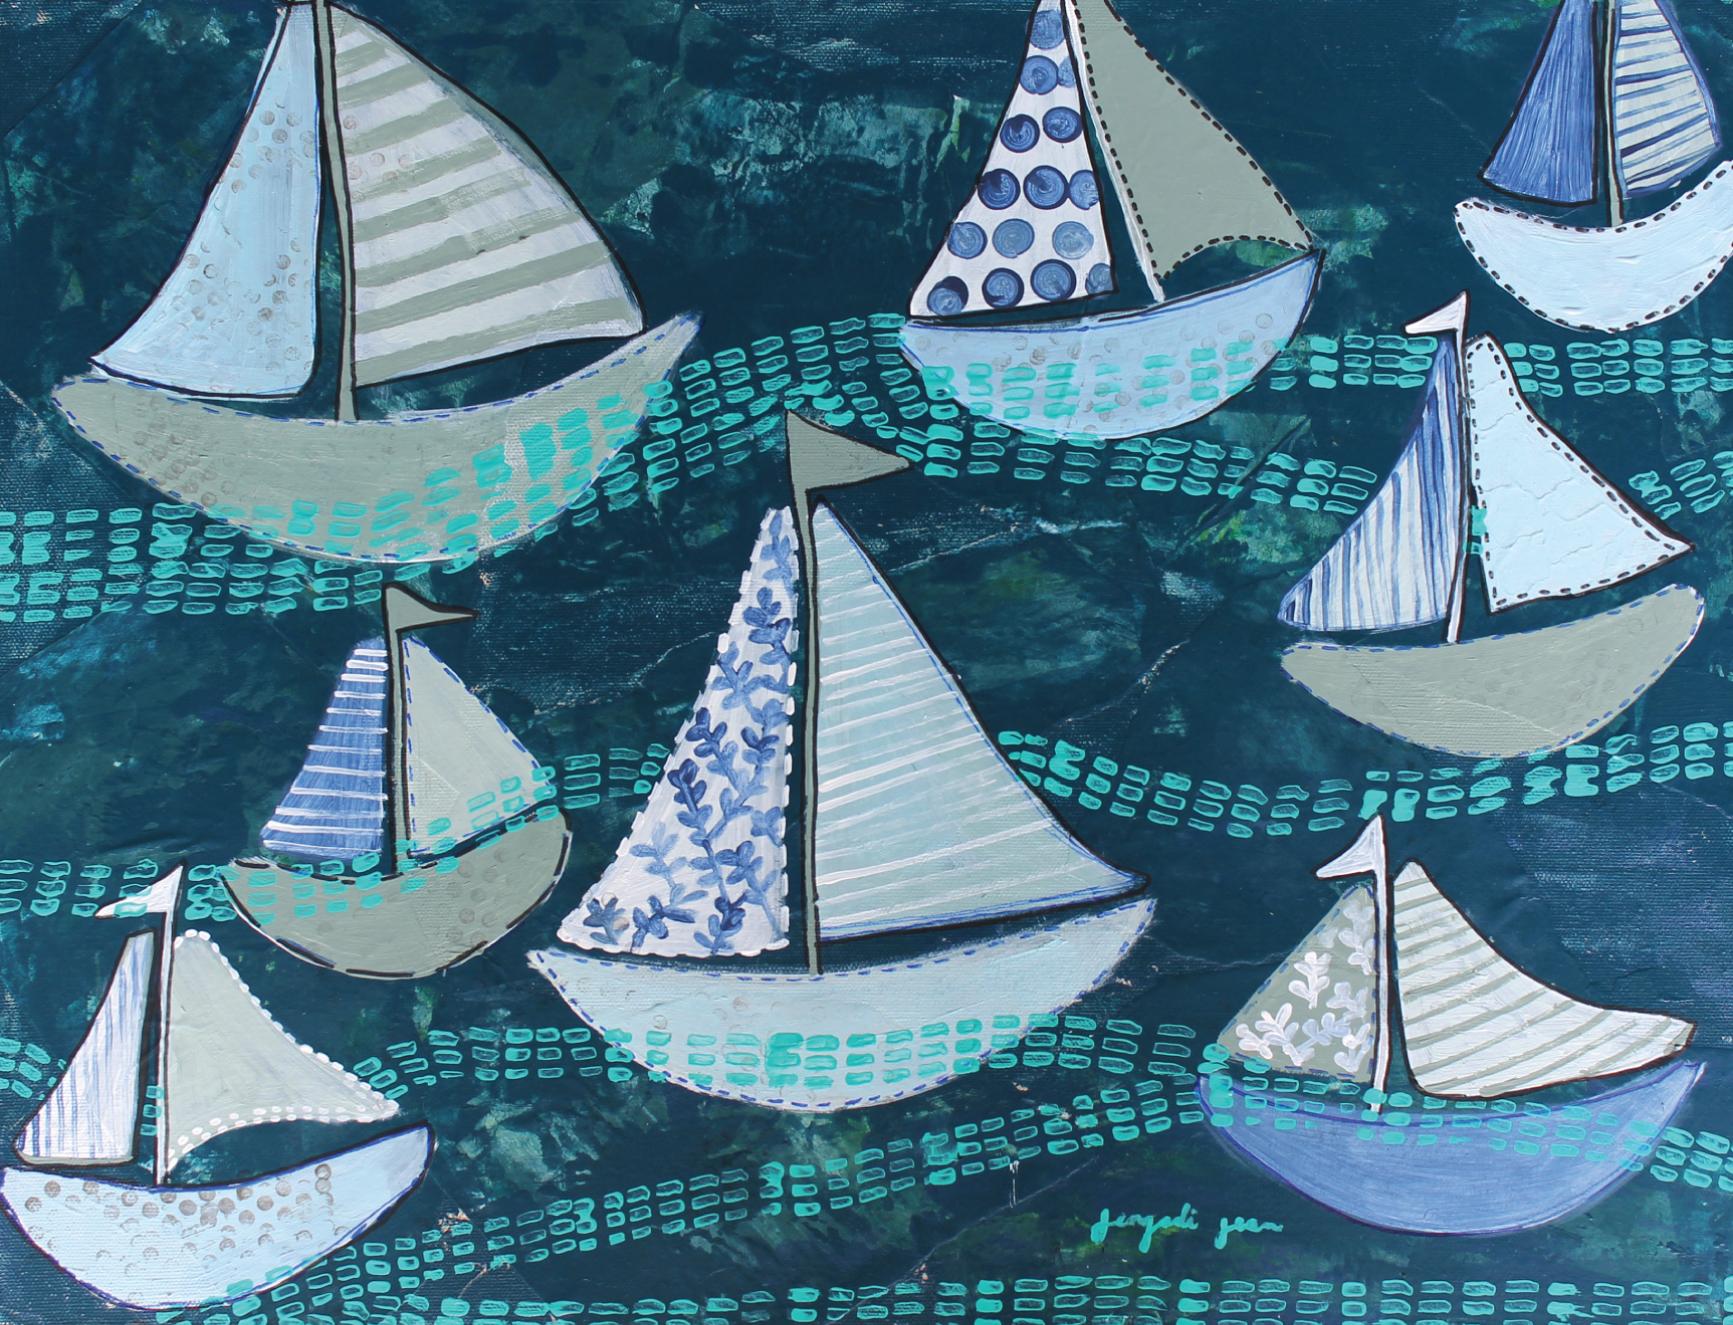 JenLavoine_MixedMediaPainting_Navy Sailboats_$350_Canvas_16x20-02.jpg